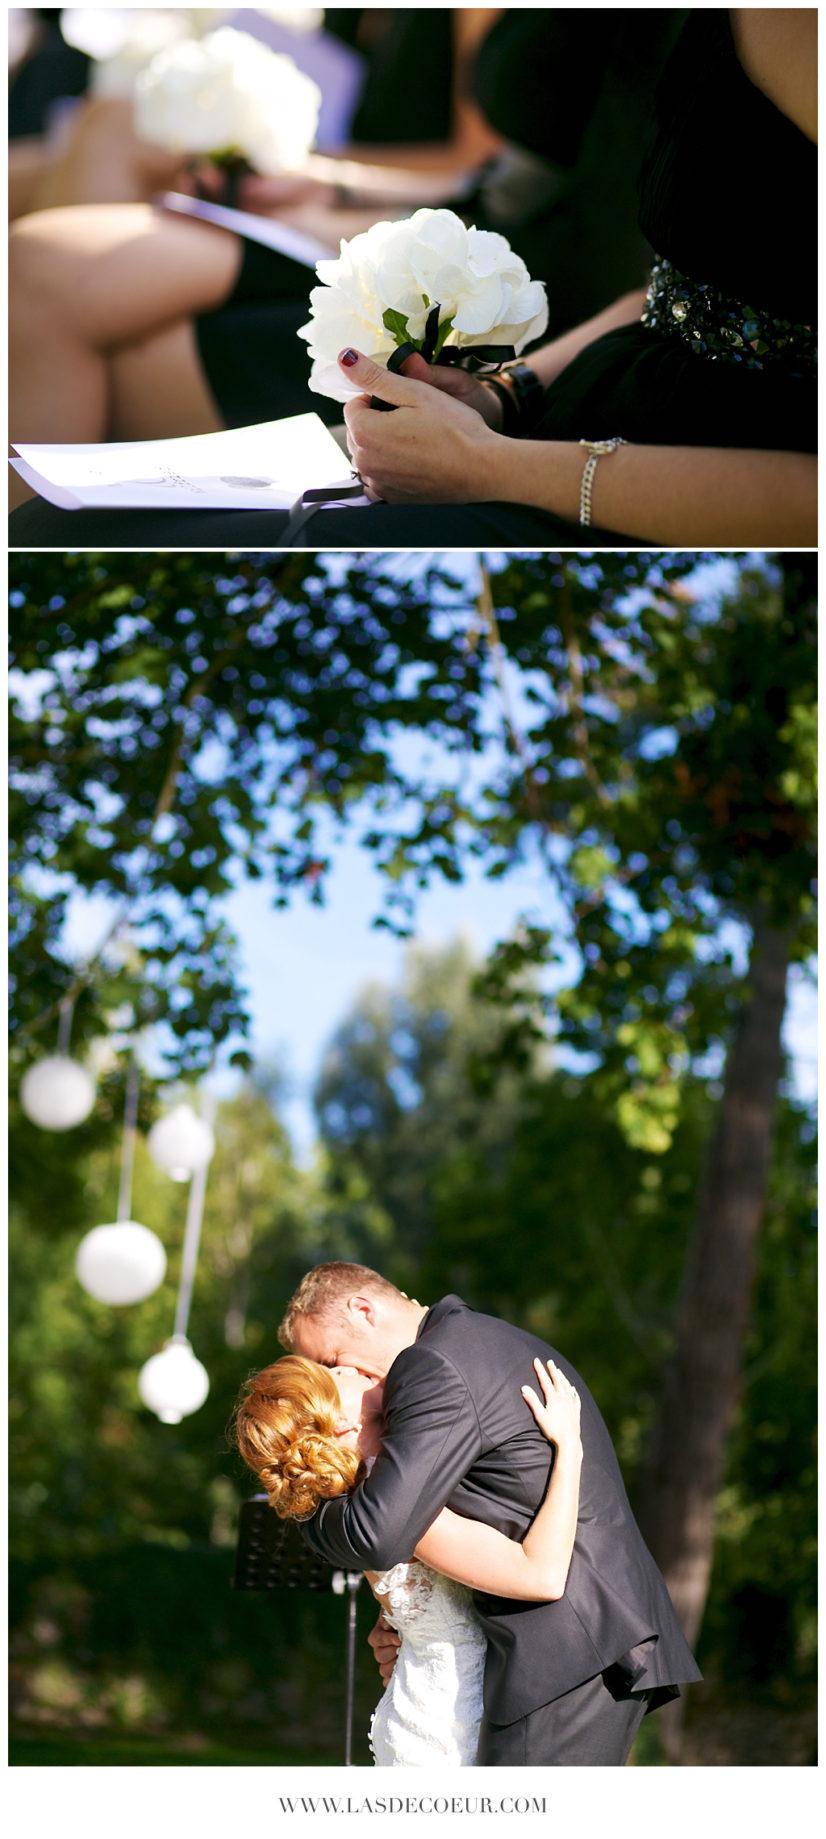 ceremonie photographe mariage lyon